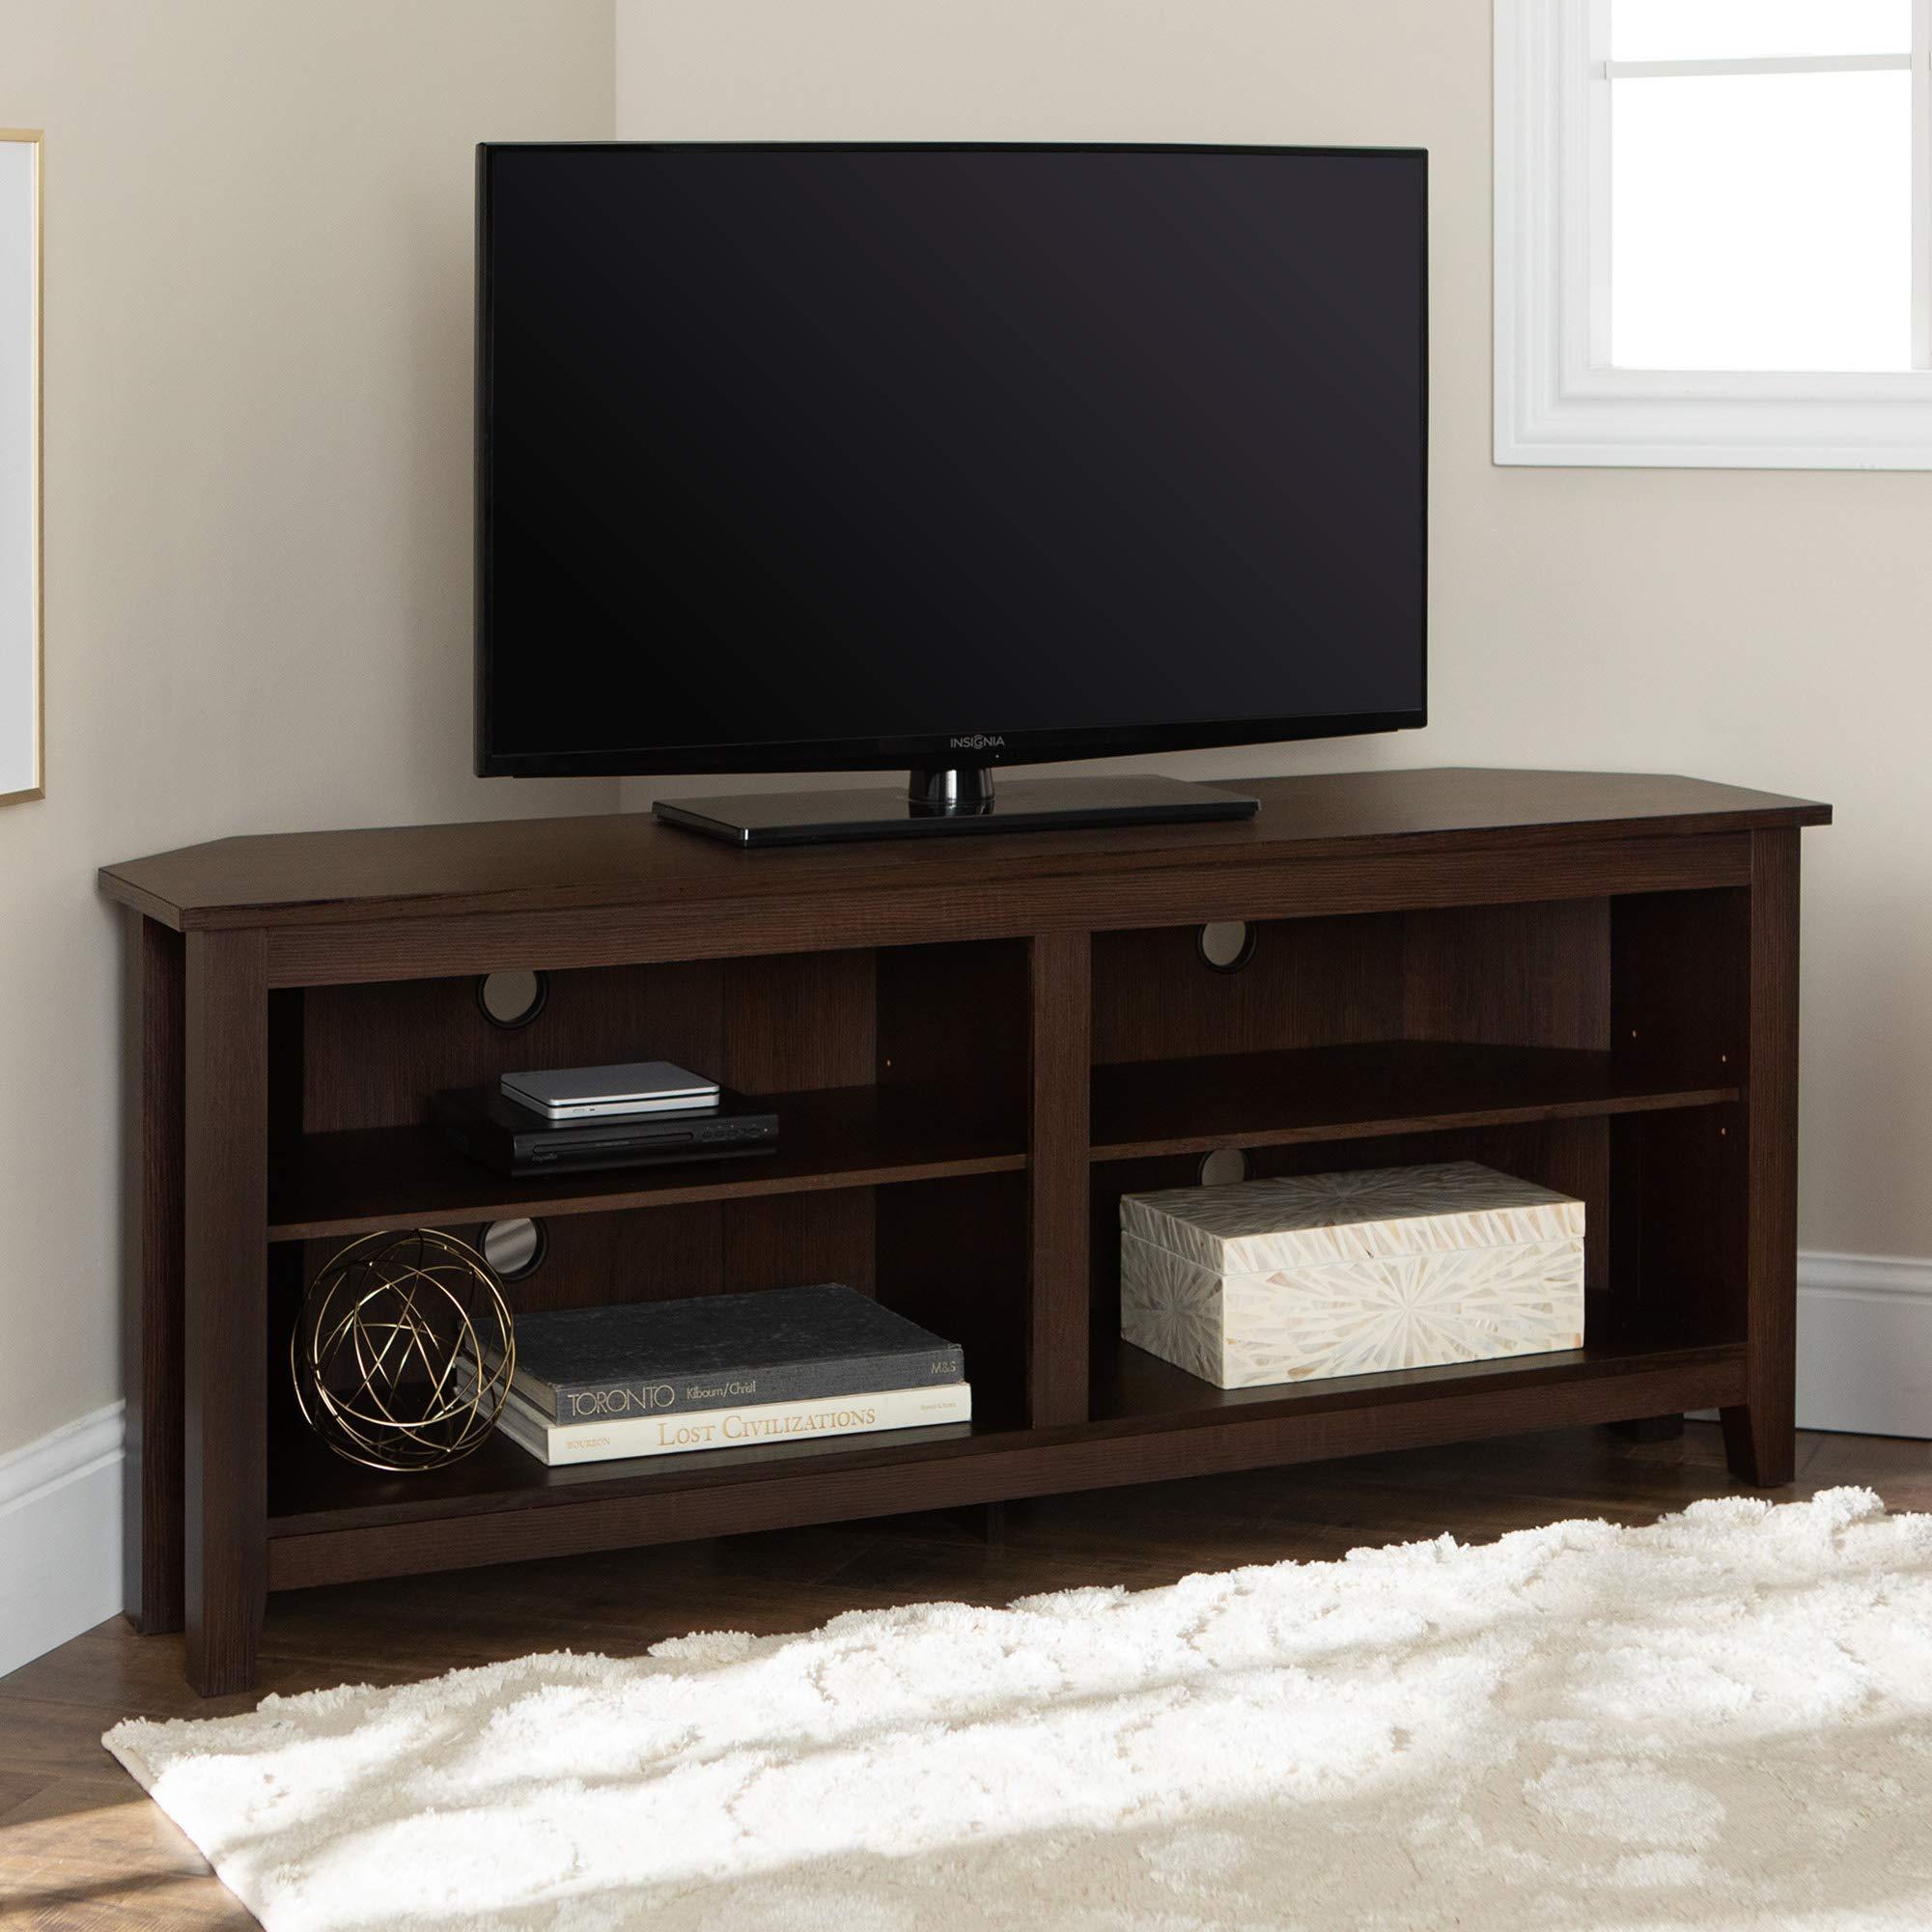 Walker Edison Milton Classic 2 Shelf Corner TV Stand for TVs up to 65 Inches, 58 Inch, Espresso